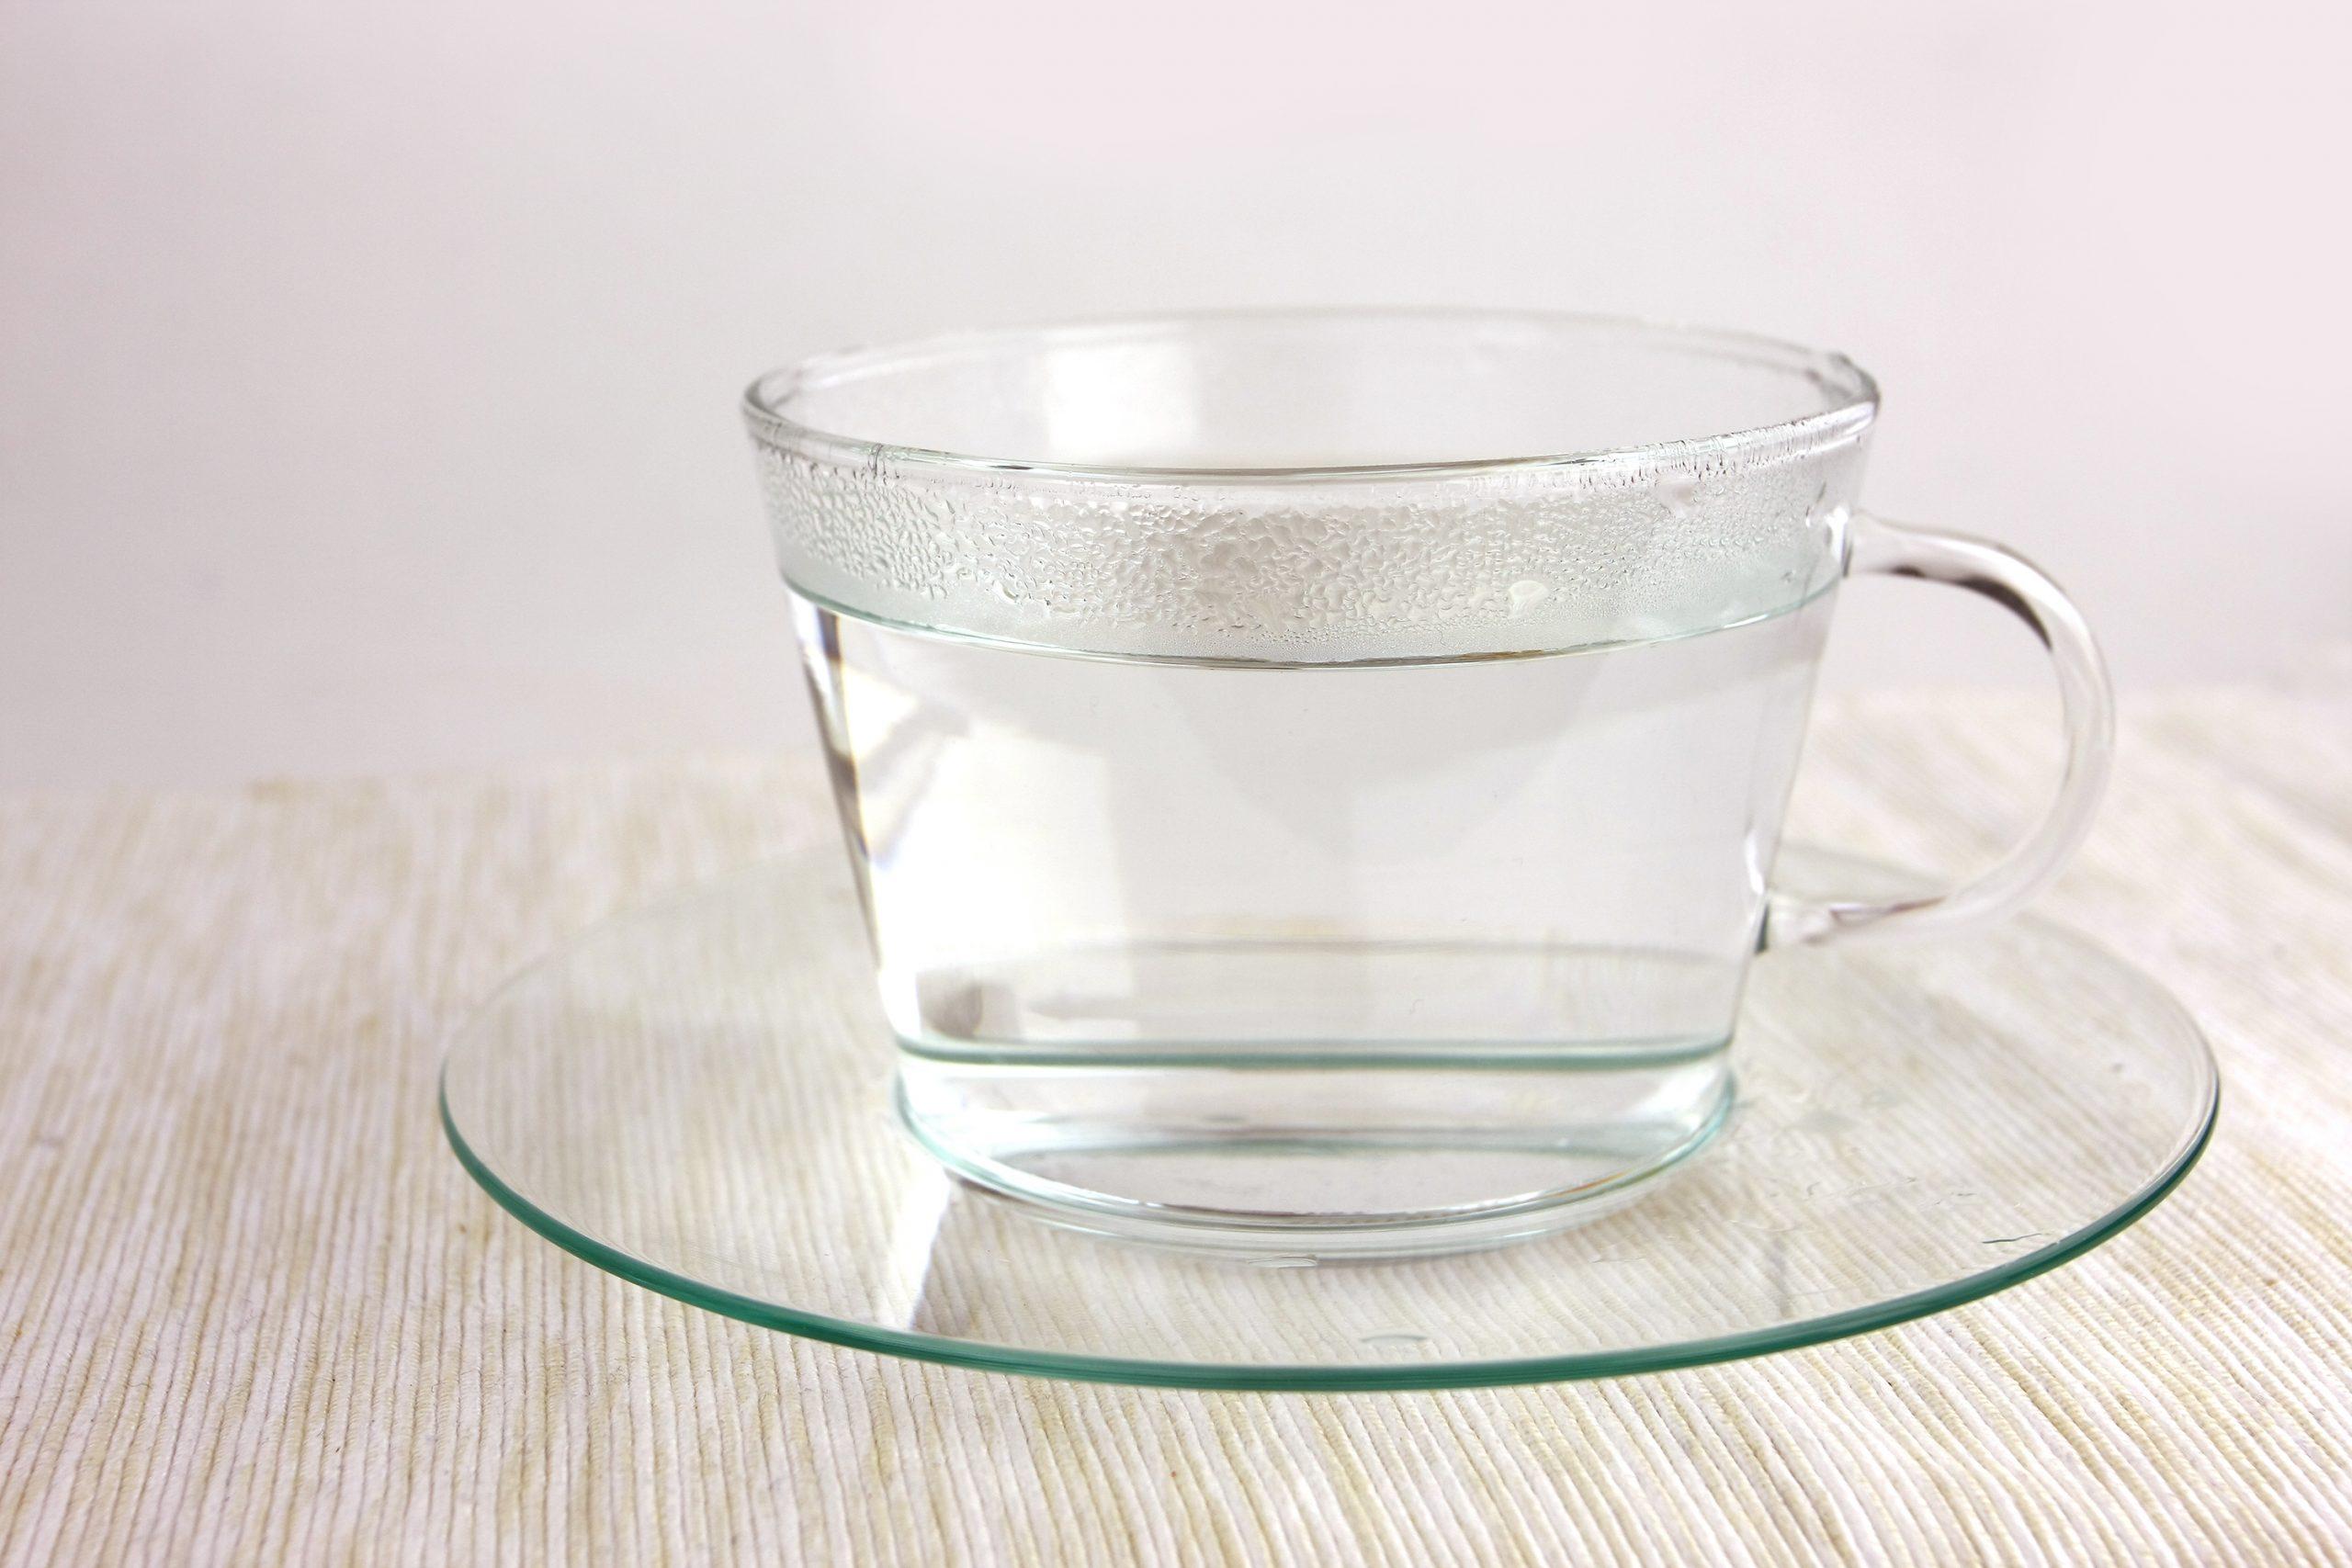 Distilled water in tea